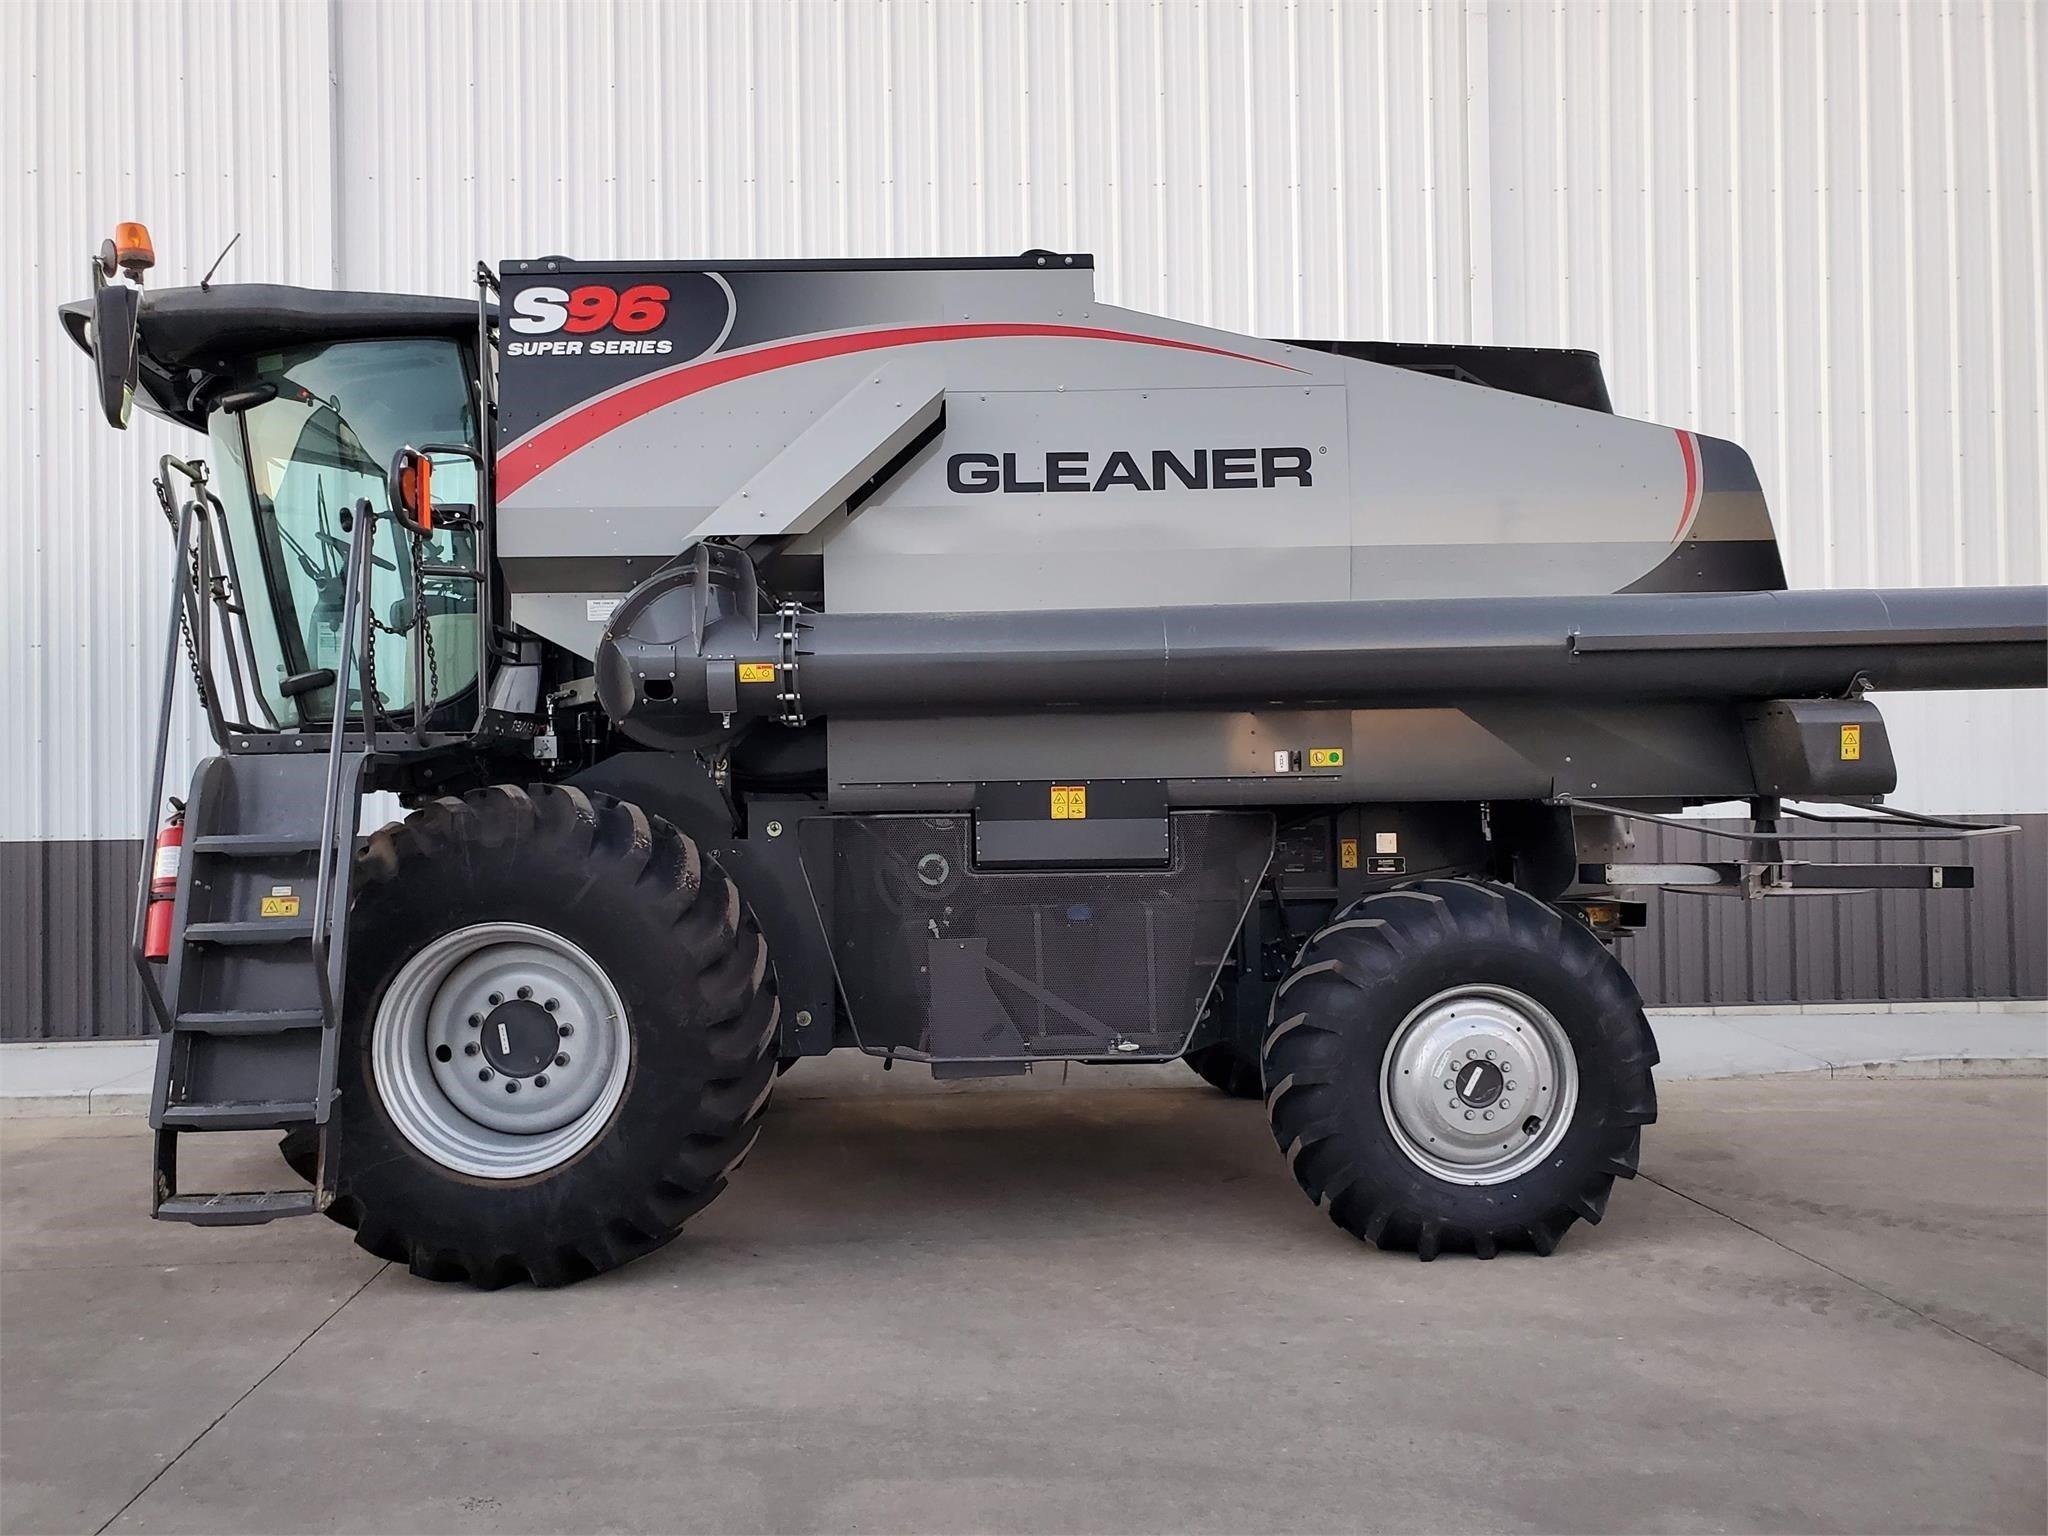 2018 Gleaner S96 Combine